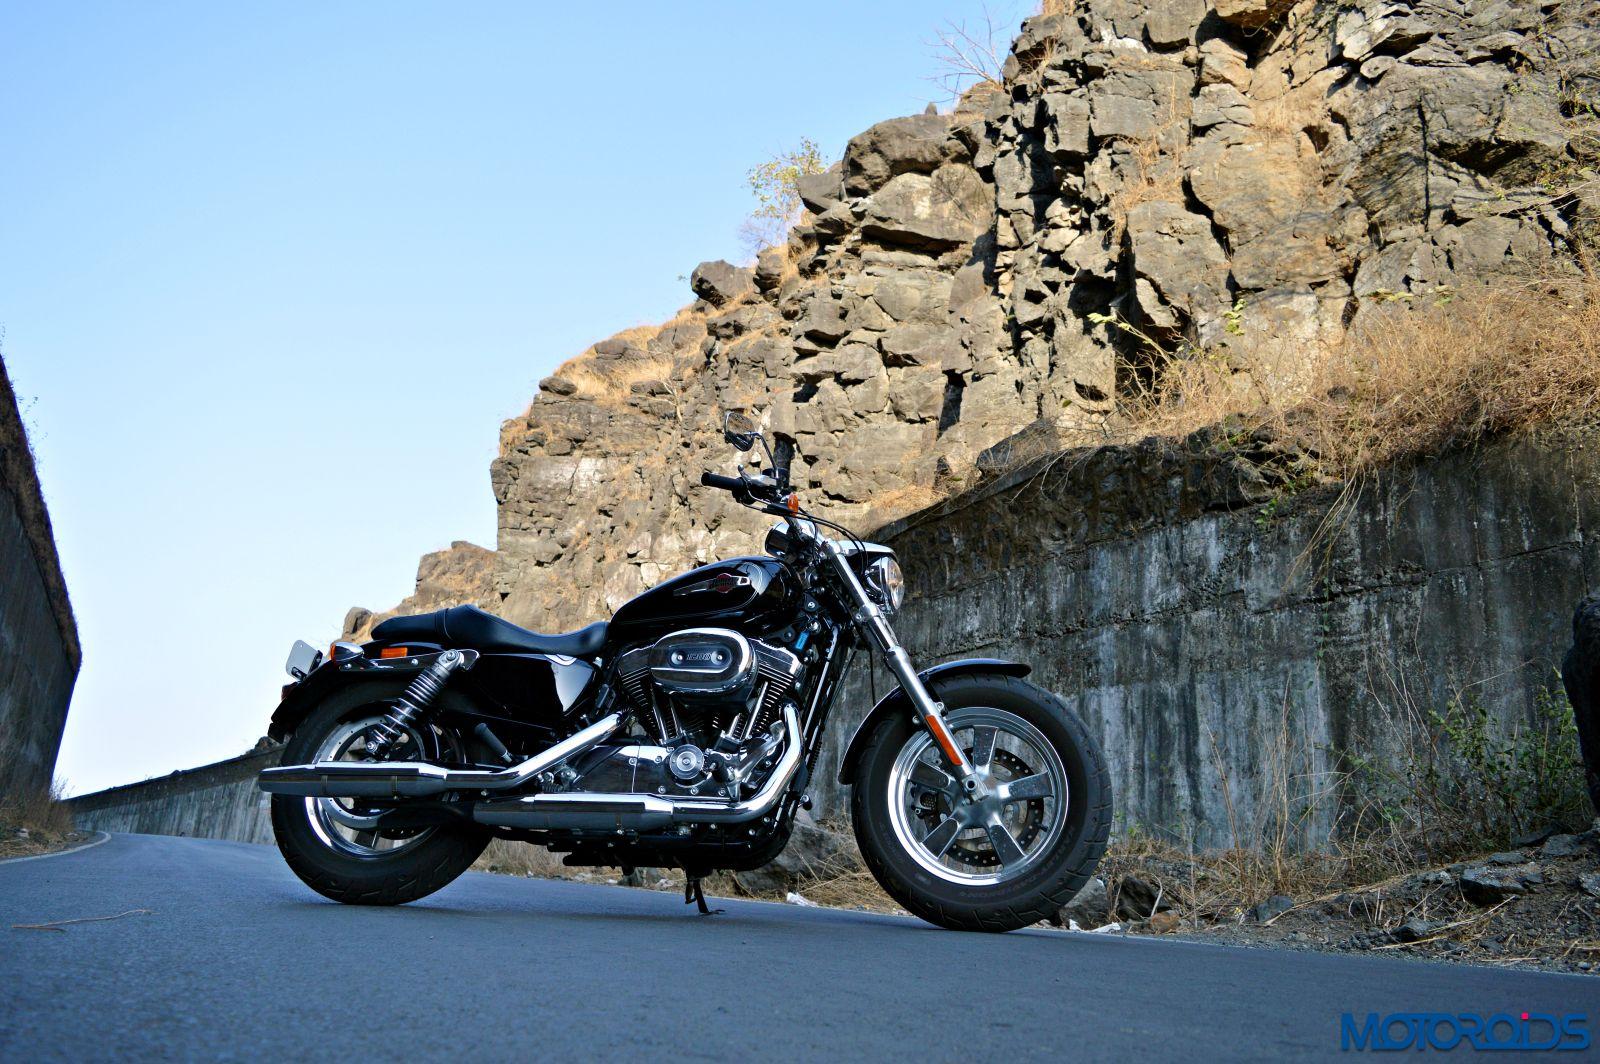 Harley-Davidson 1200 Custom Review - Still Shots (8)